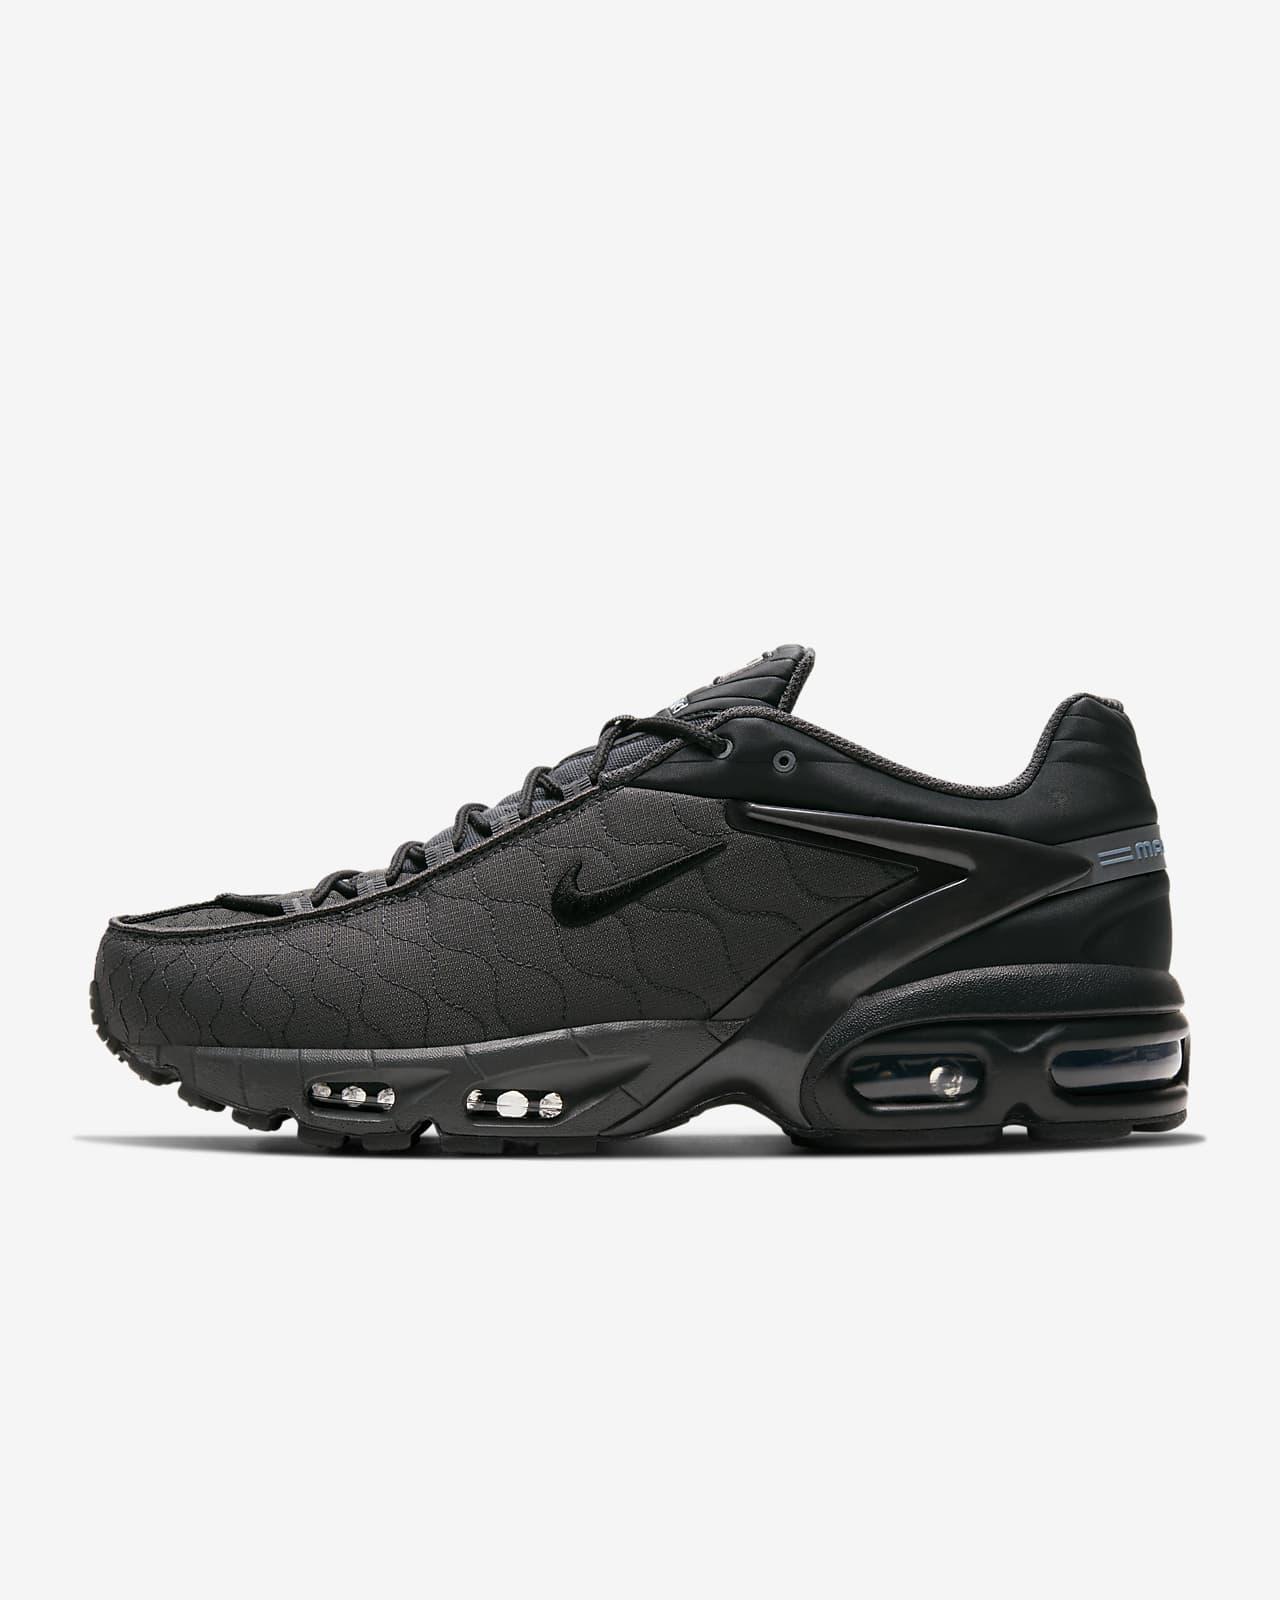 Nike Air Max Tailwind V SP Men's Shoe